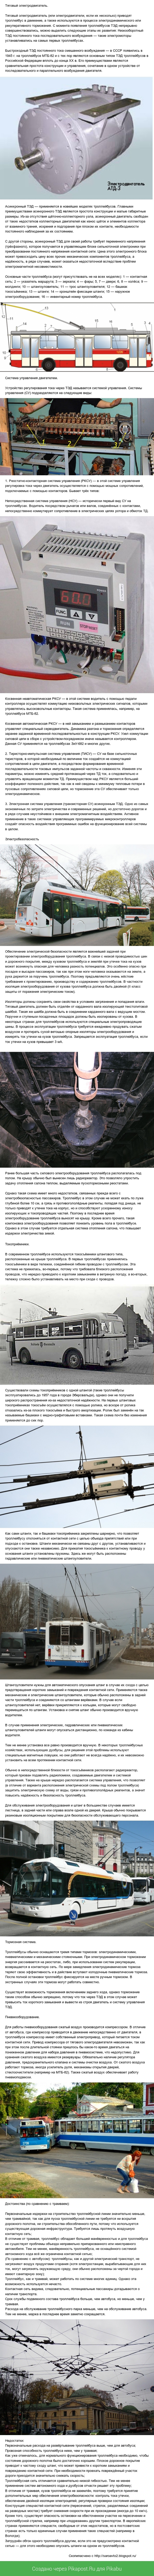 Все о троллейбусе ( Часть 6) Копипаста, Троллейбус, Длиннопост